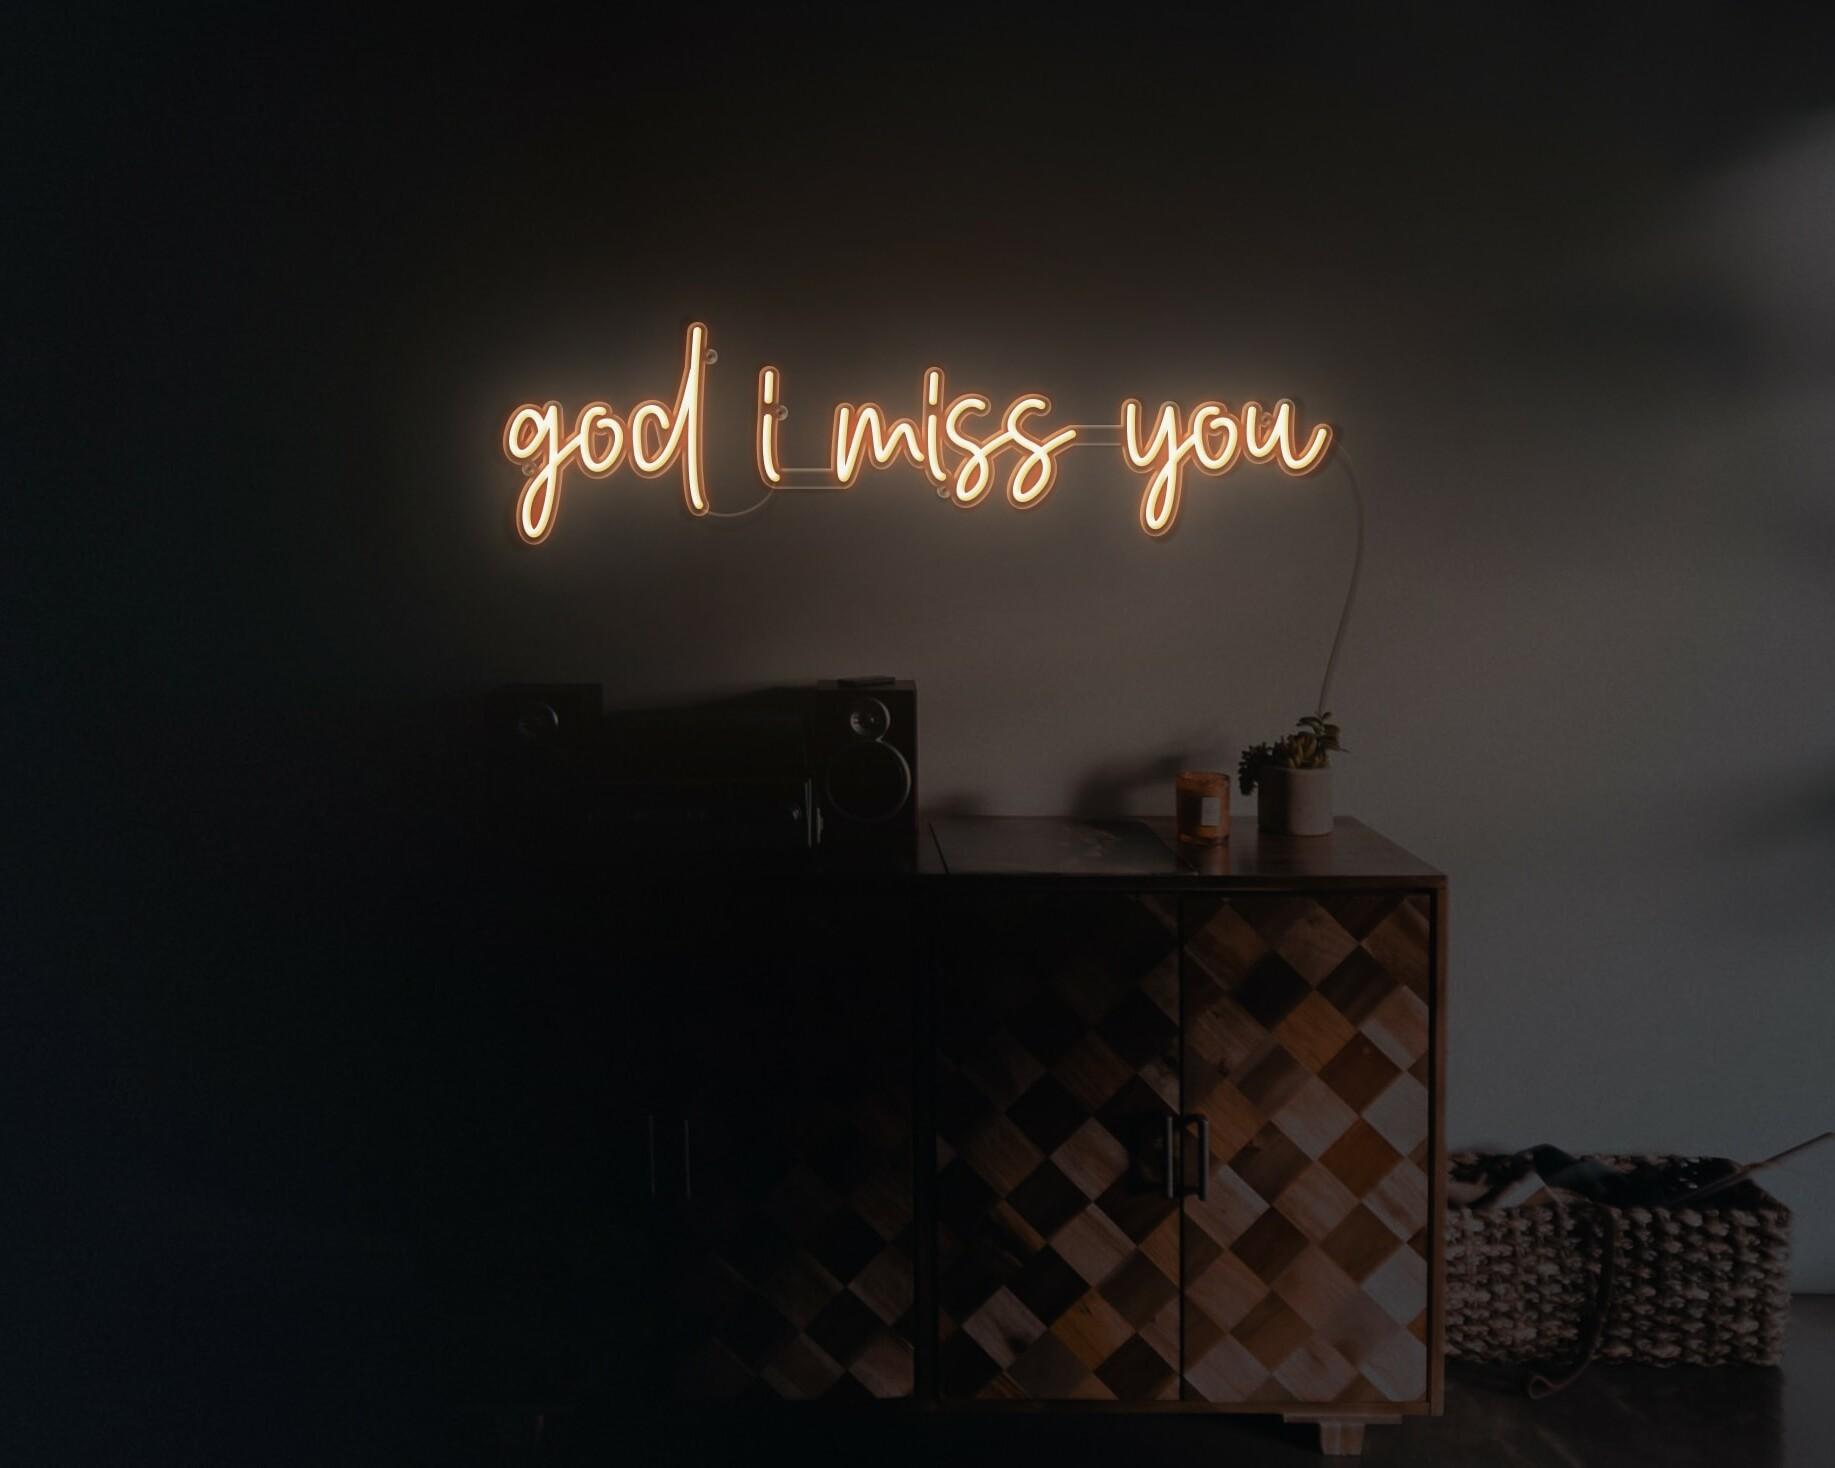 god i miss you neon light